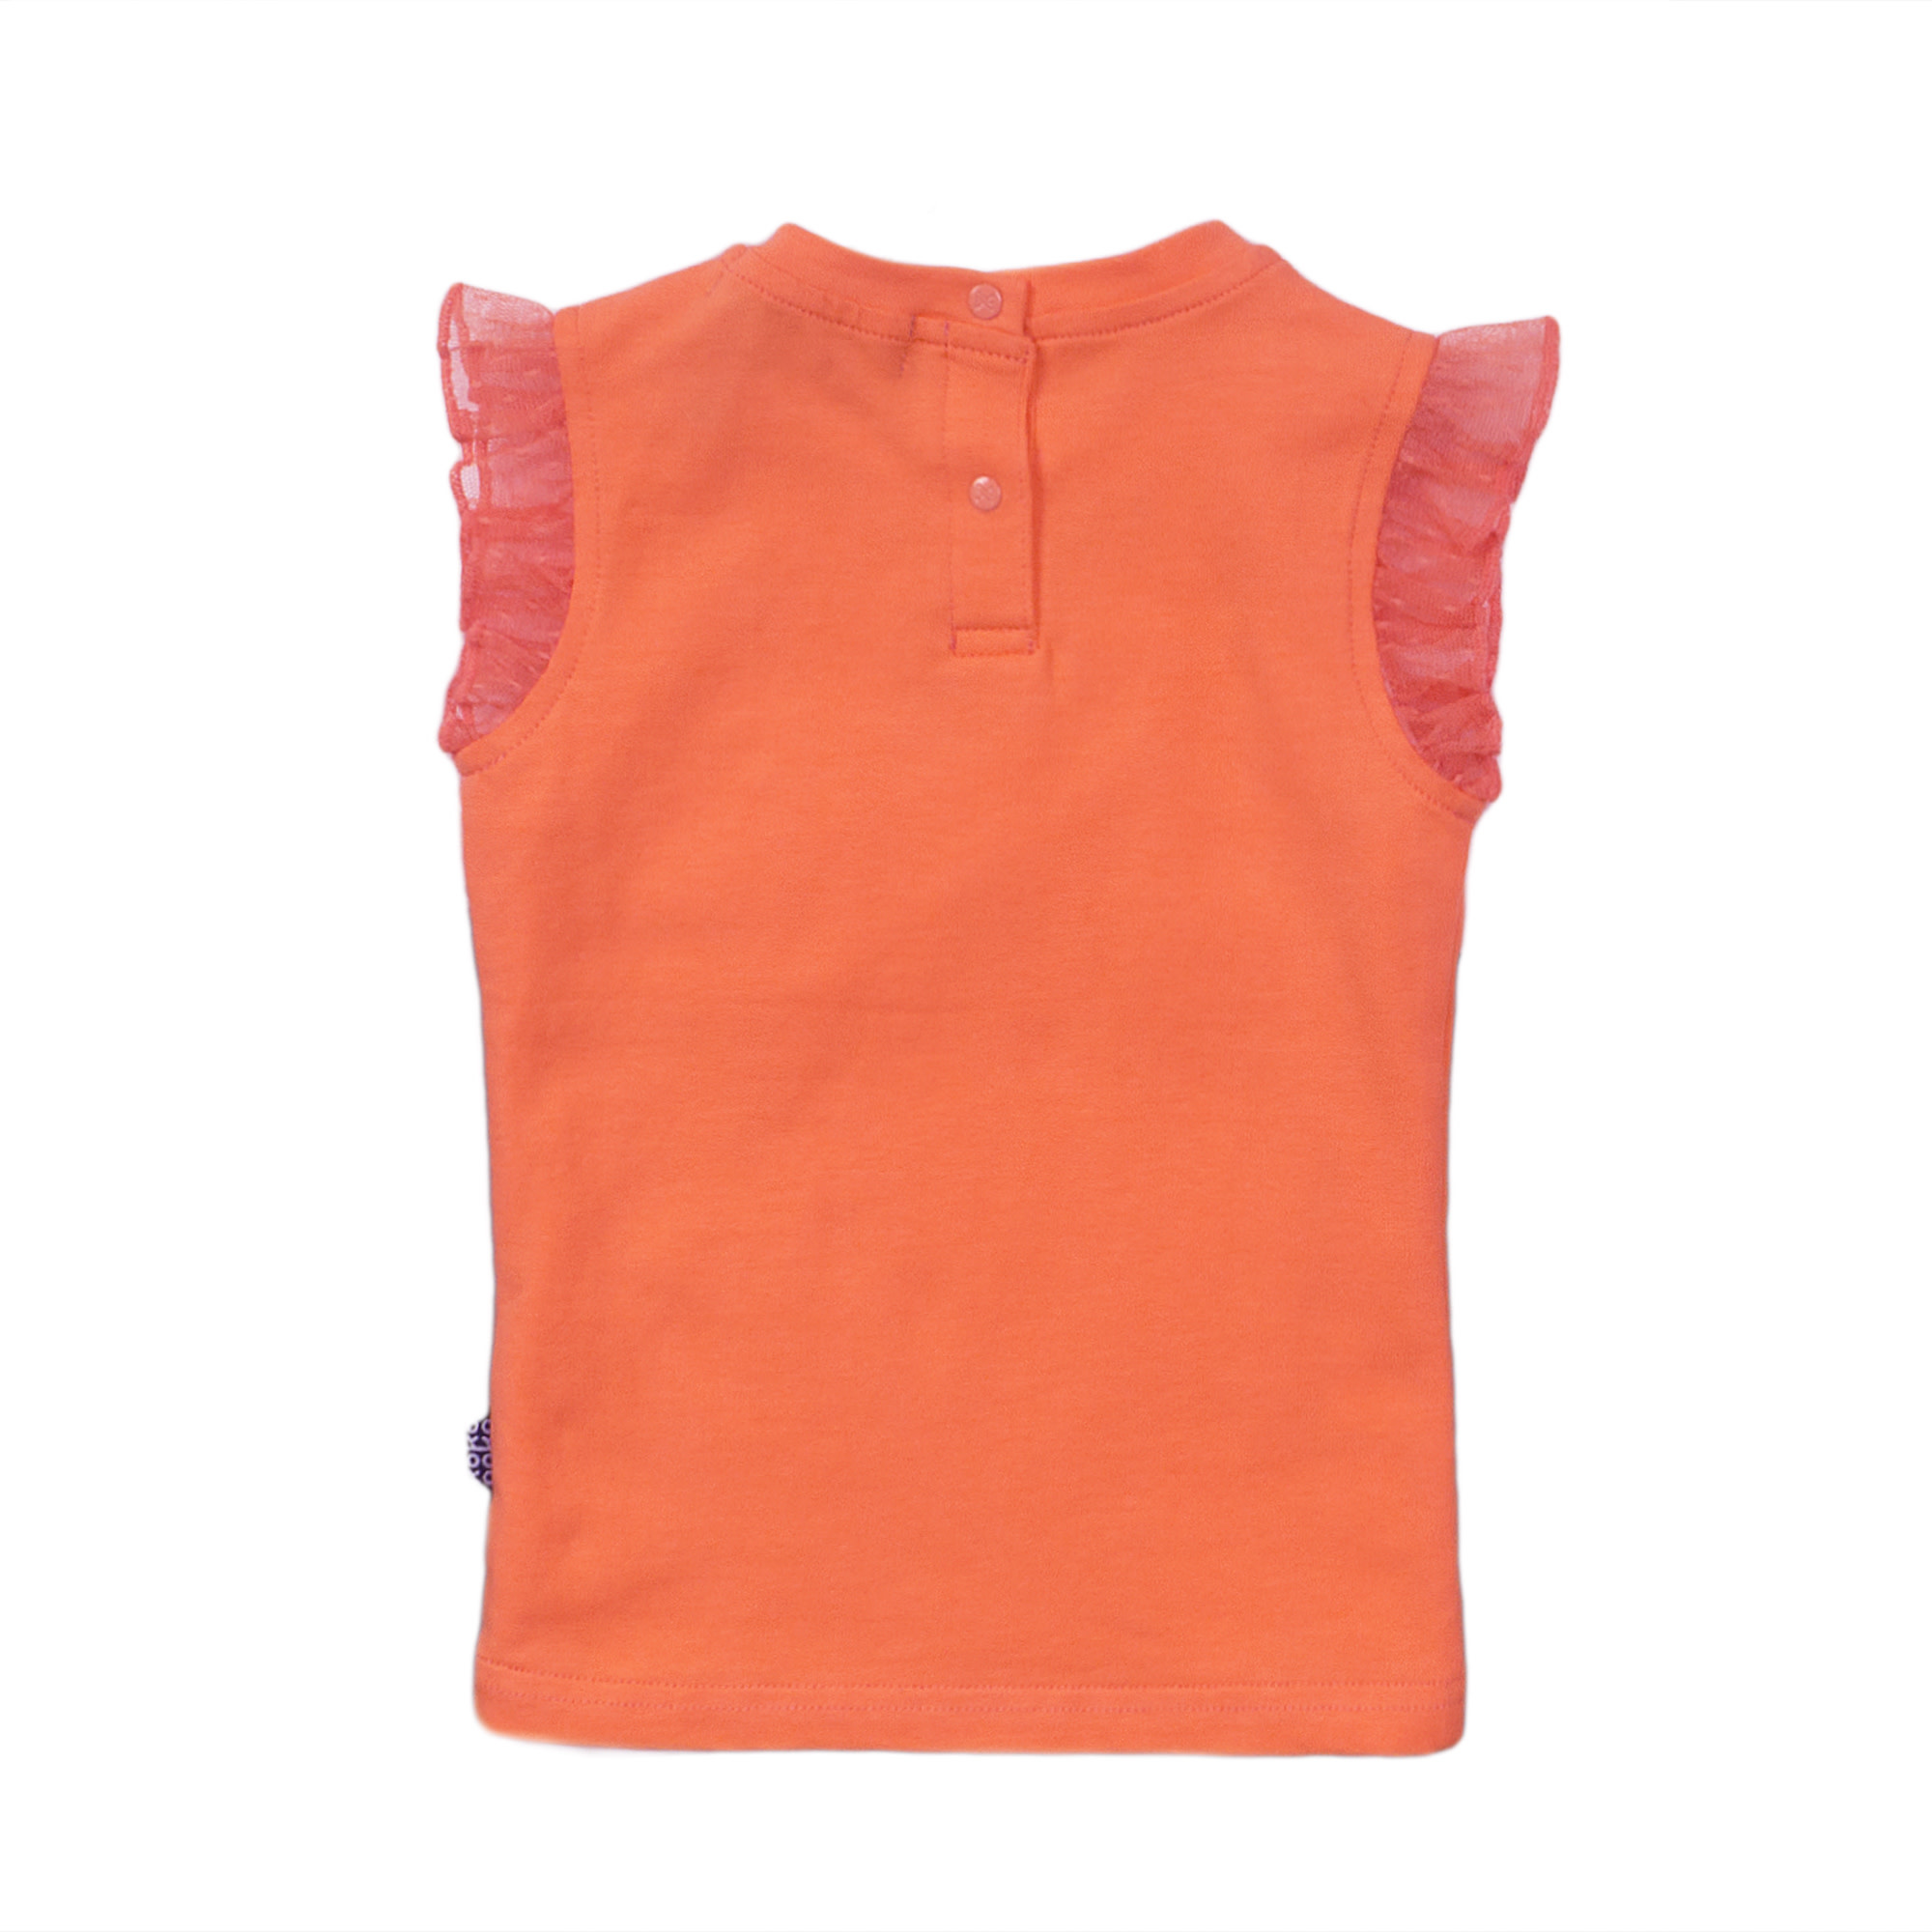 Koko Noko Meisjes Shirtje KM E38954-37-2